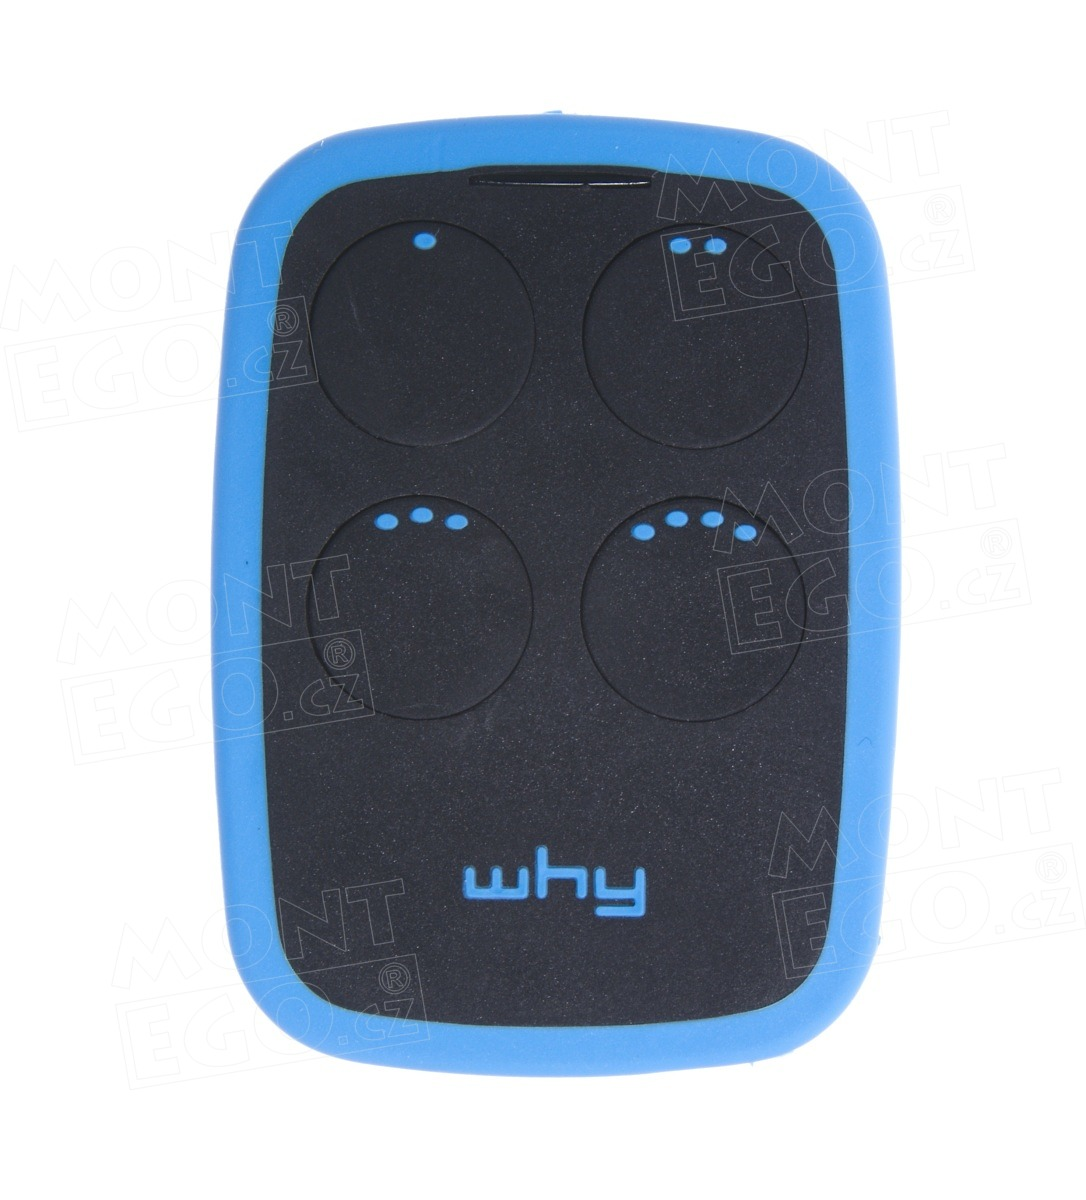 Multi ovladač Sice WHYEVO .Blu63, programovatelný 4-kanálový dálkový ovladač na vrata, černá-modrá